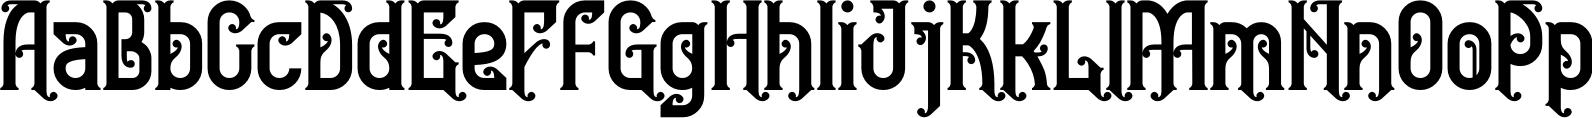 Bedesau Typeface